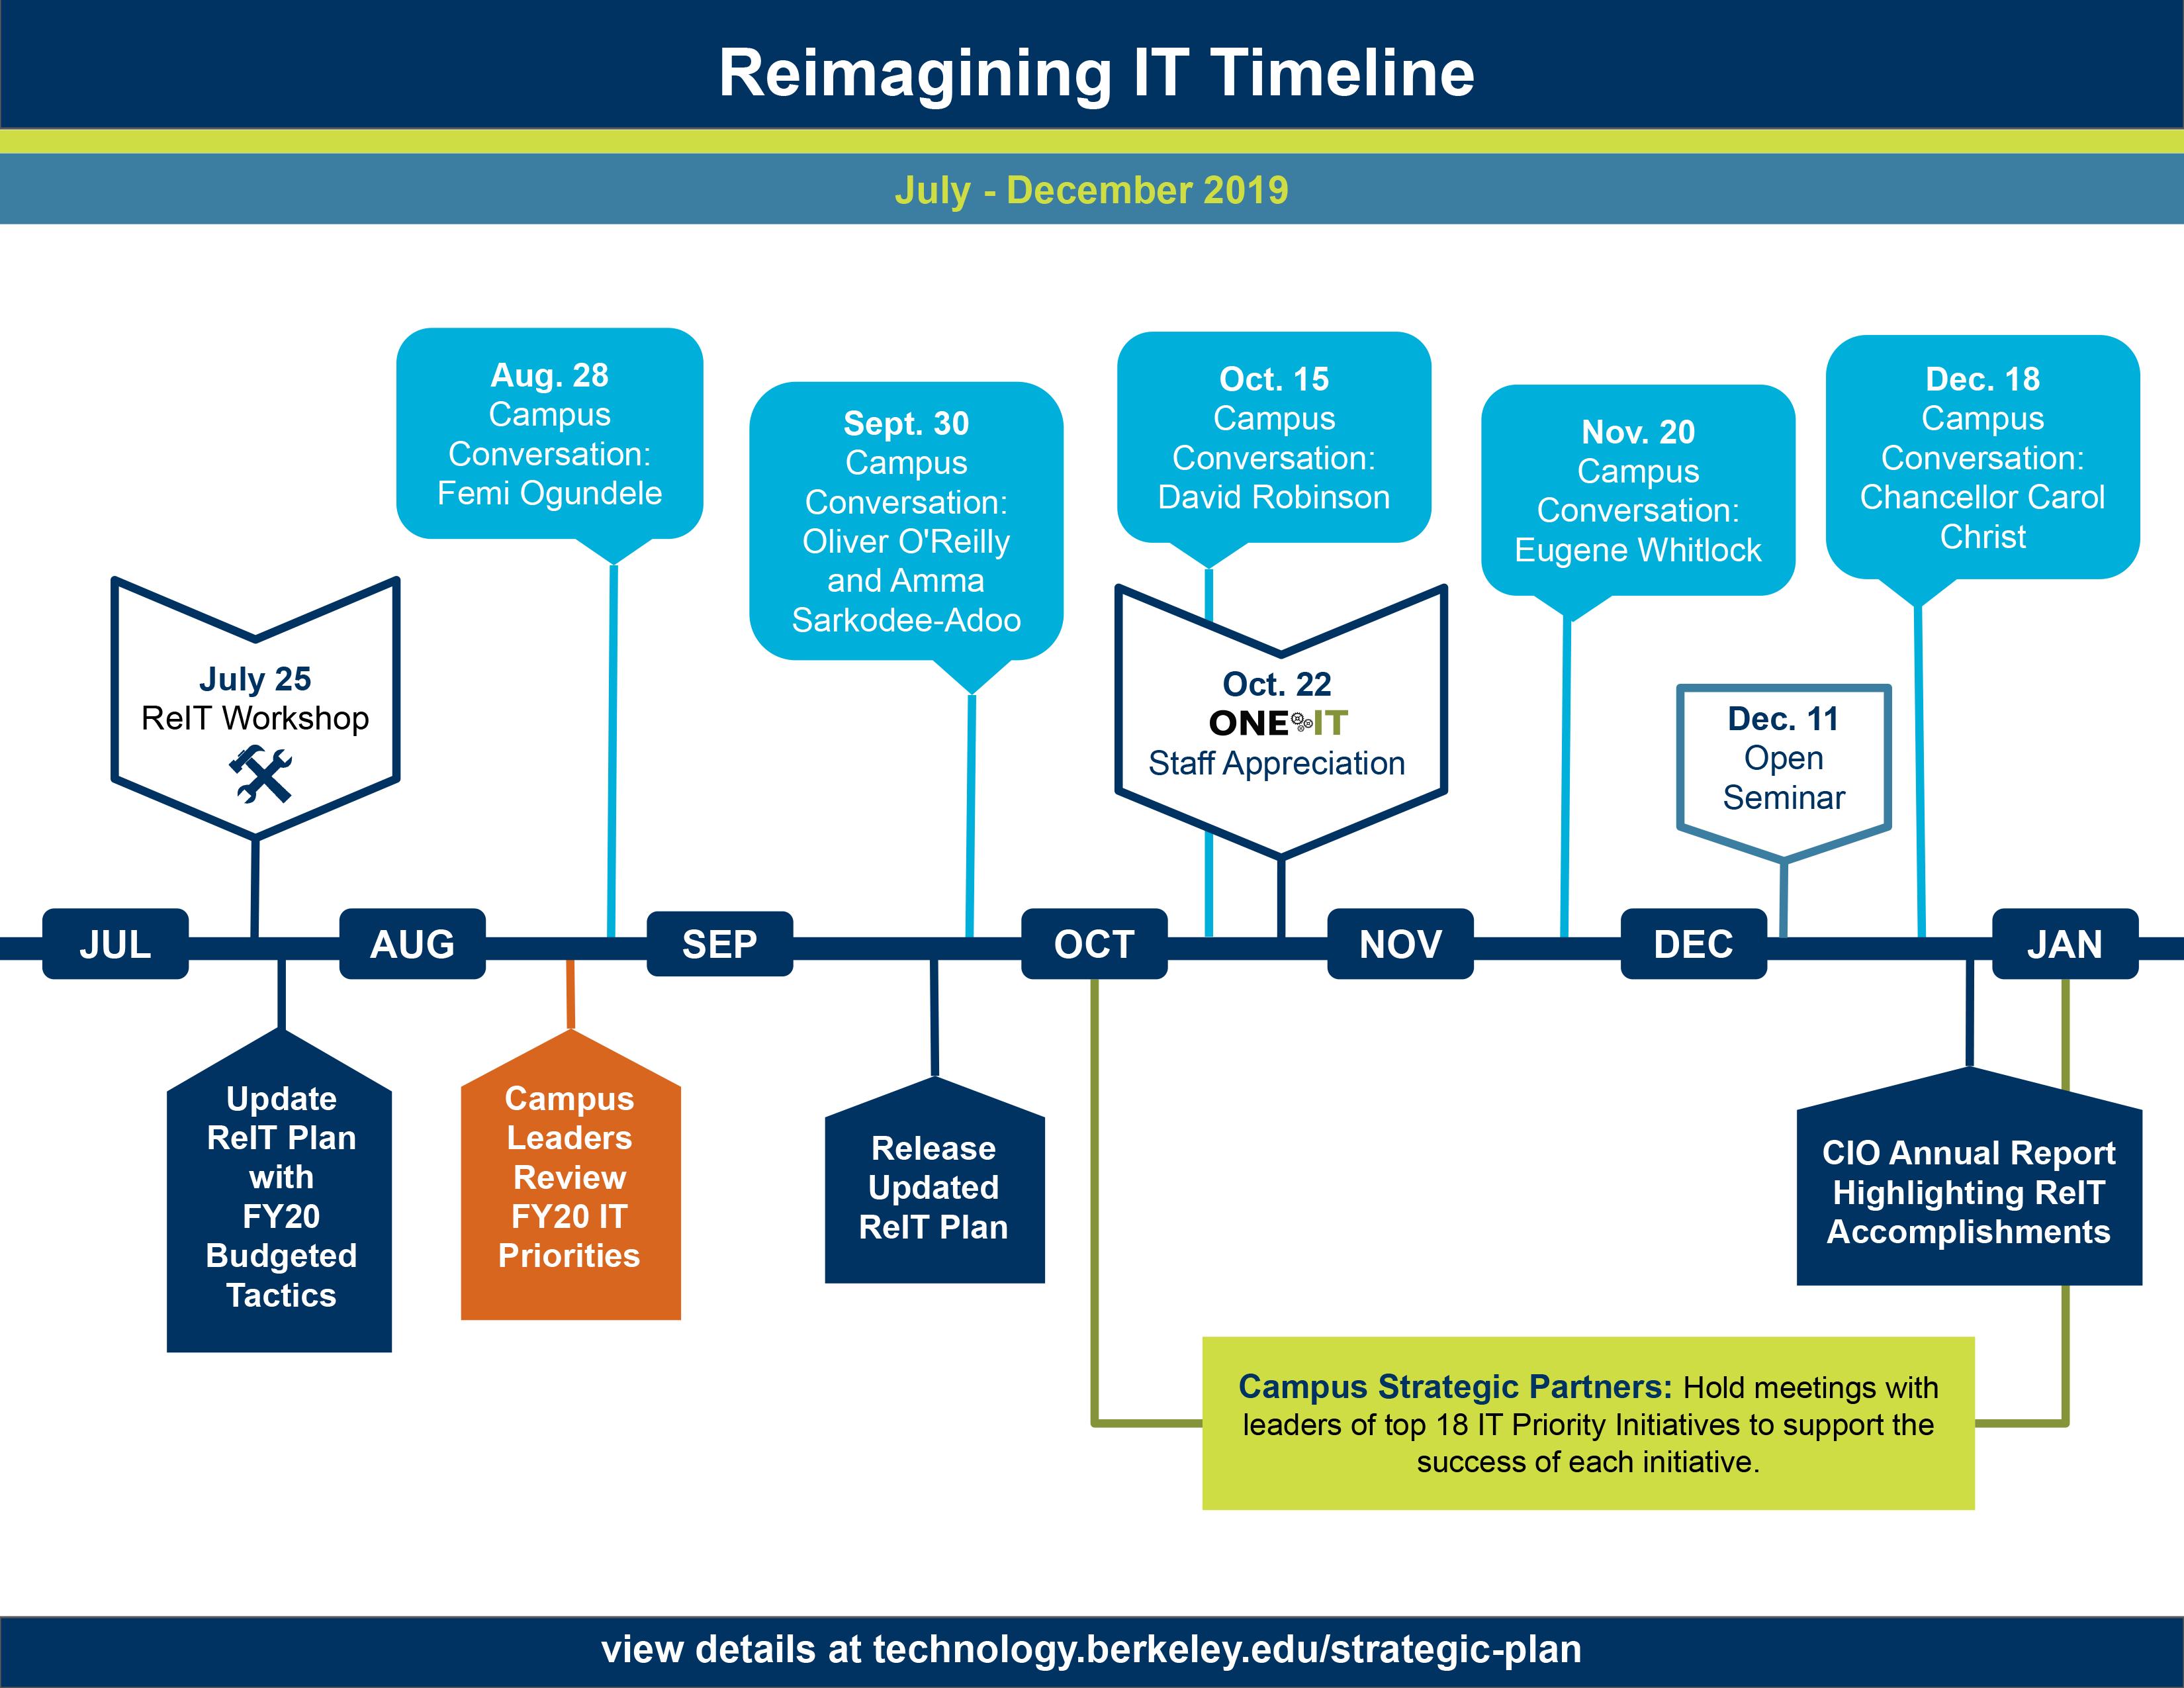 ReIT timeline July to Dec 2019